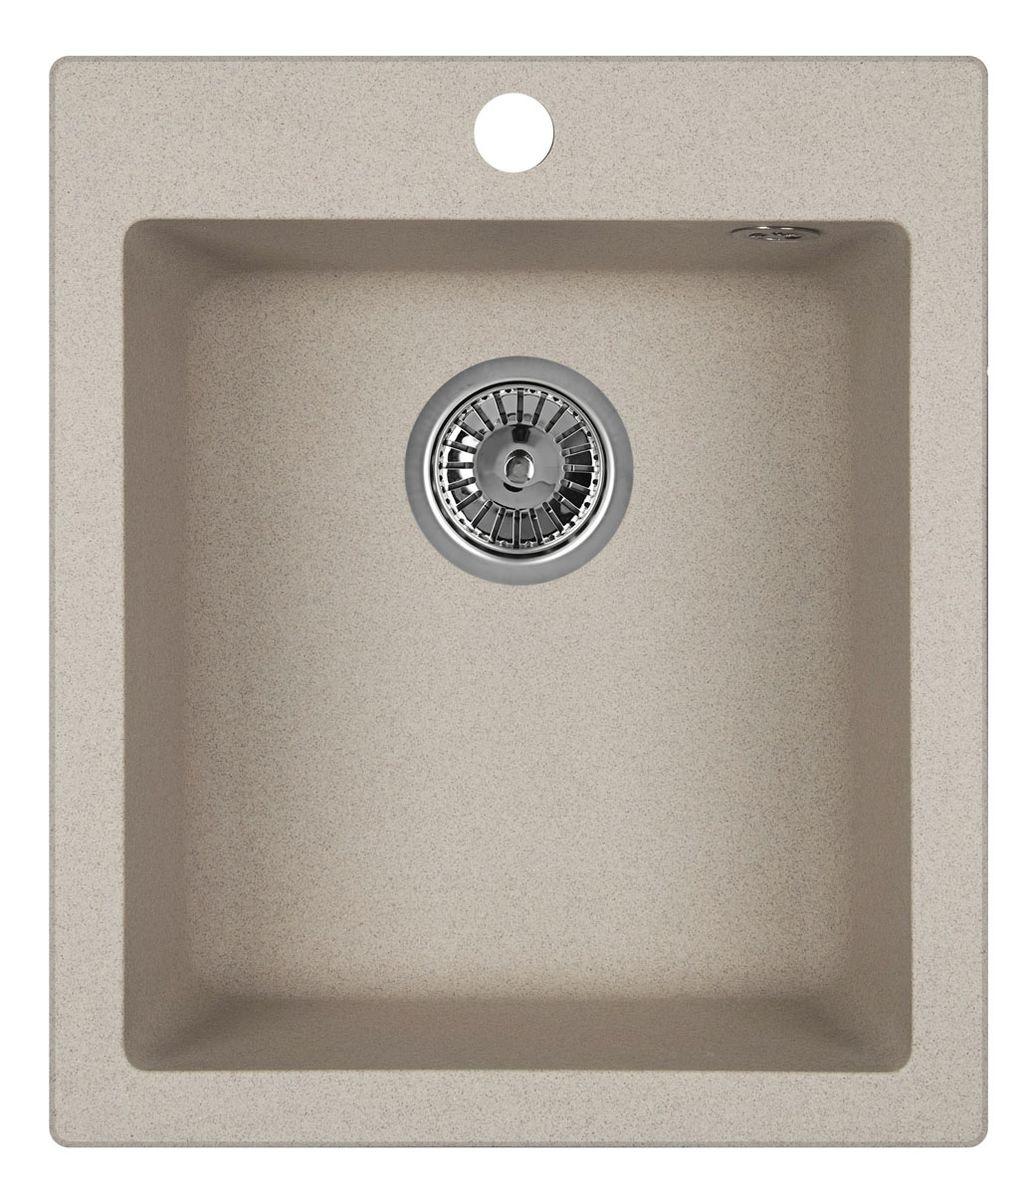 "����� Weissgauff ""Quadro 420 Eco Granit"", ����: ����� ���, 41,5 � 19,5 � 49,0 ��"